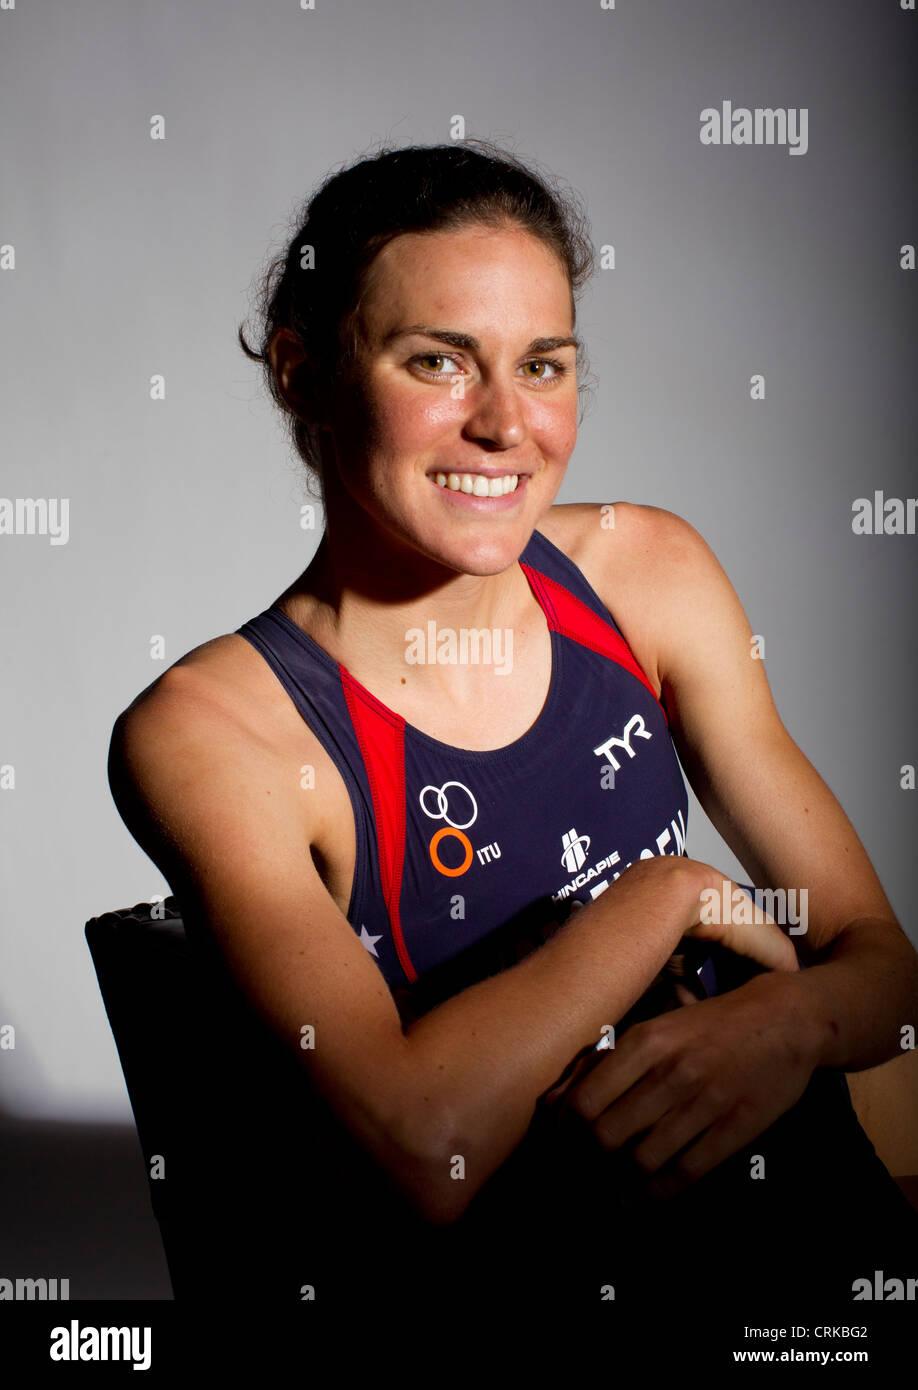 Triathlete Gwen Jorgensen at the Team USA Media Summit in Dallas, TX in advance of the 2012 London Olympics. Stock Photo